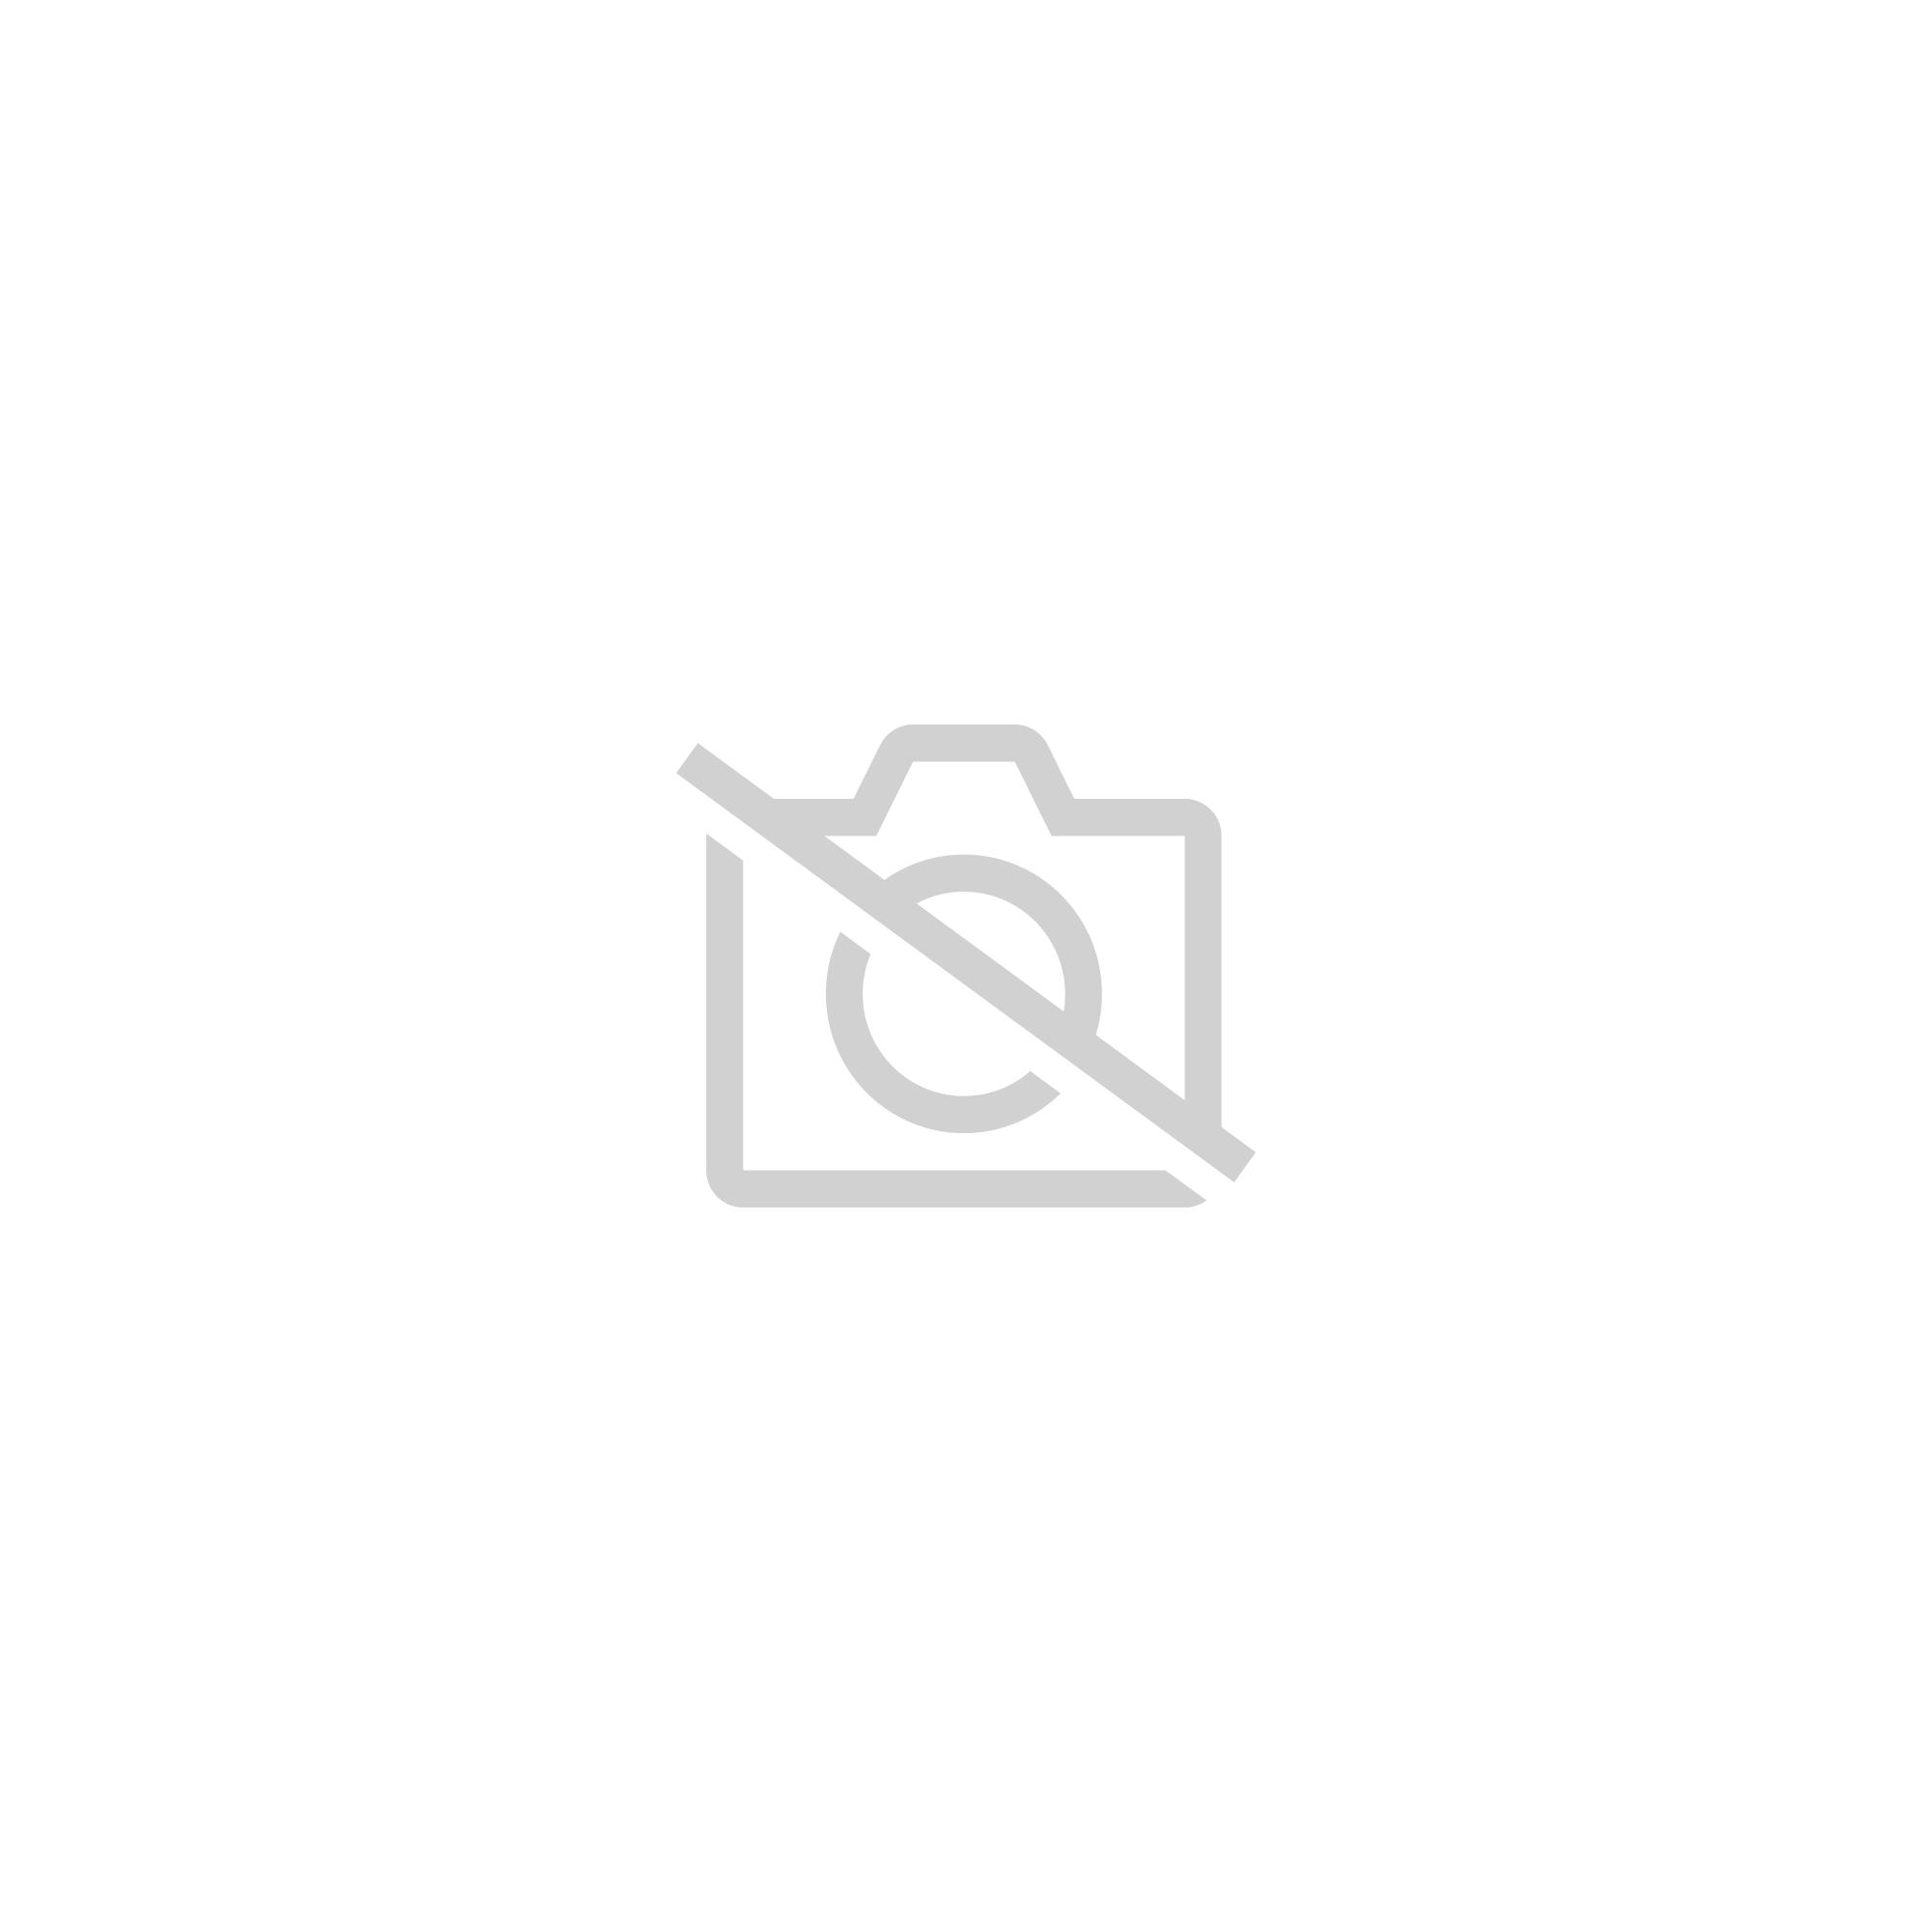 Wilson Federer Elite Bag Sac De Tennis